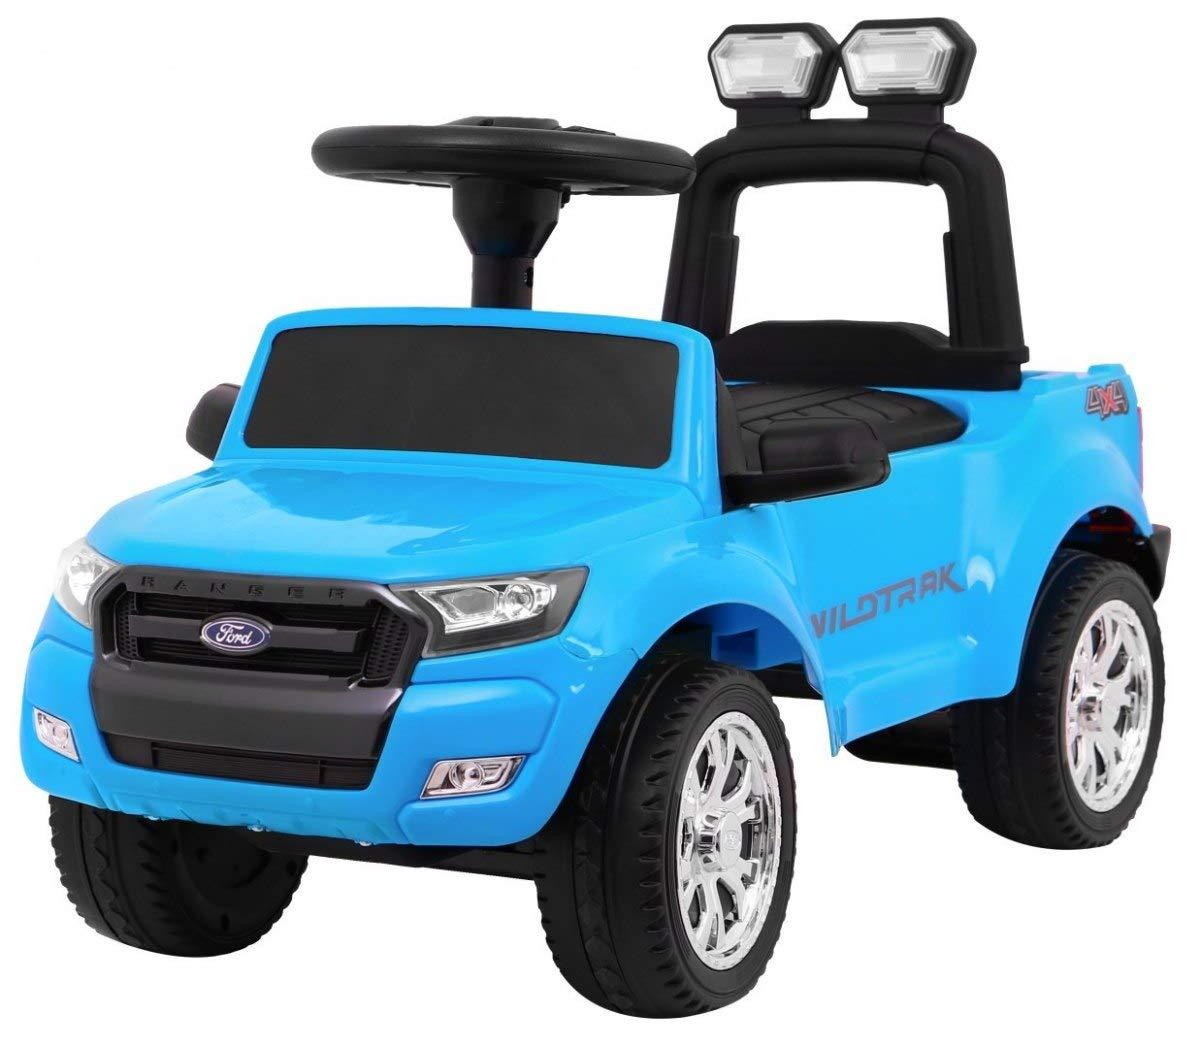 Auto per Bambini Girello Cavalcabile Bobby Car - Ford Ranger - Blu